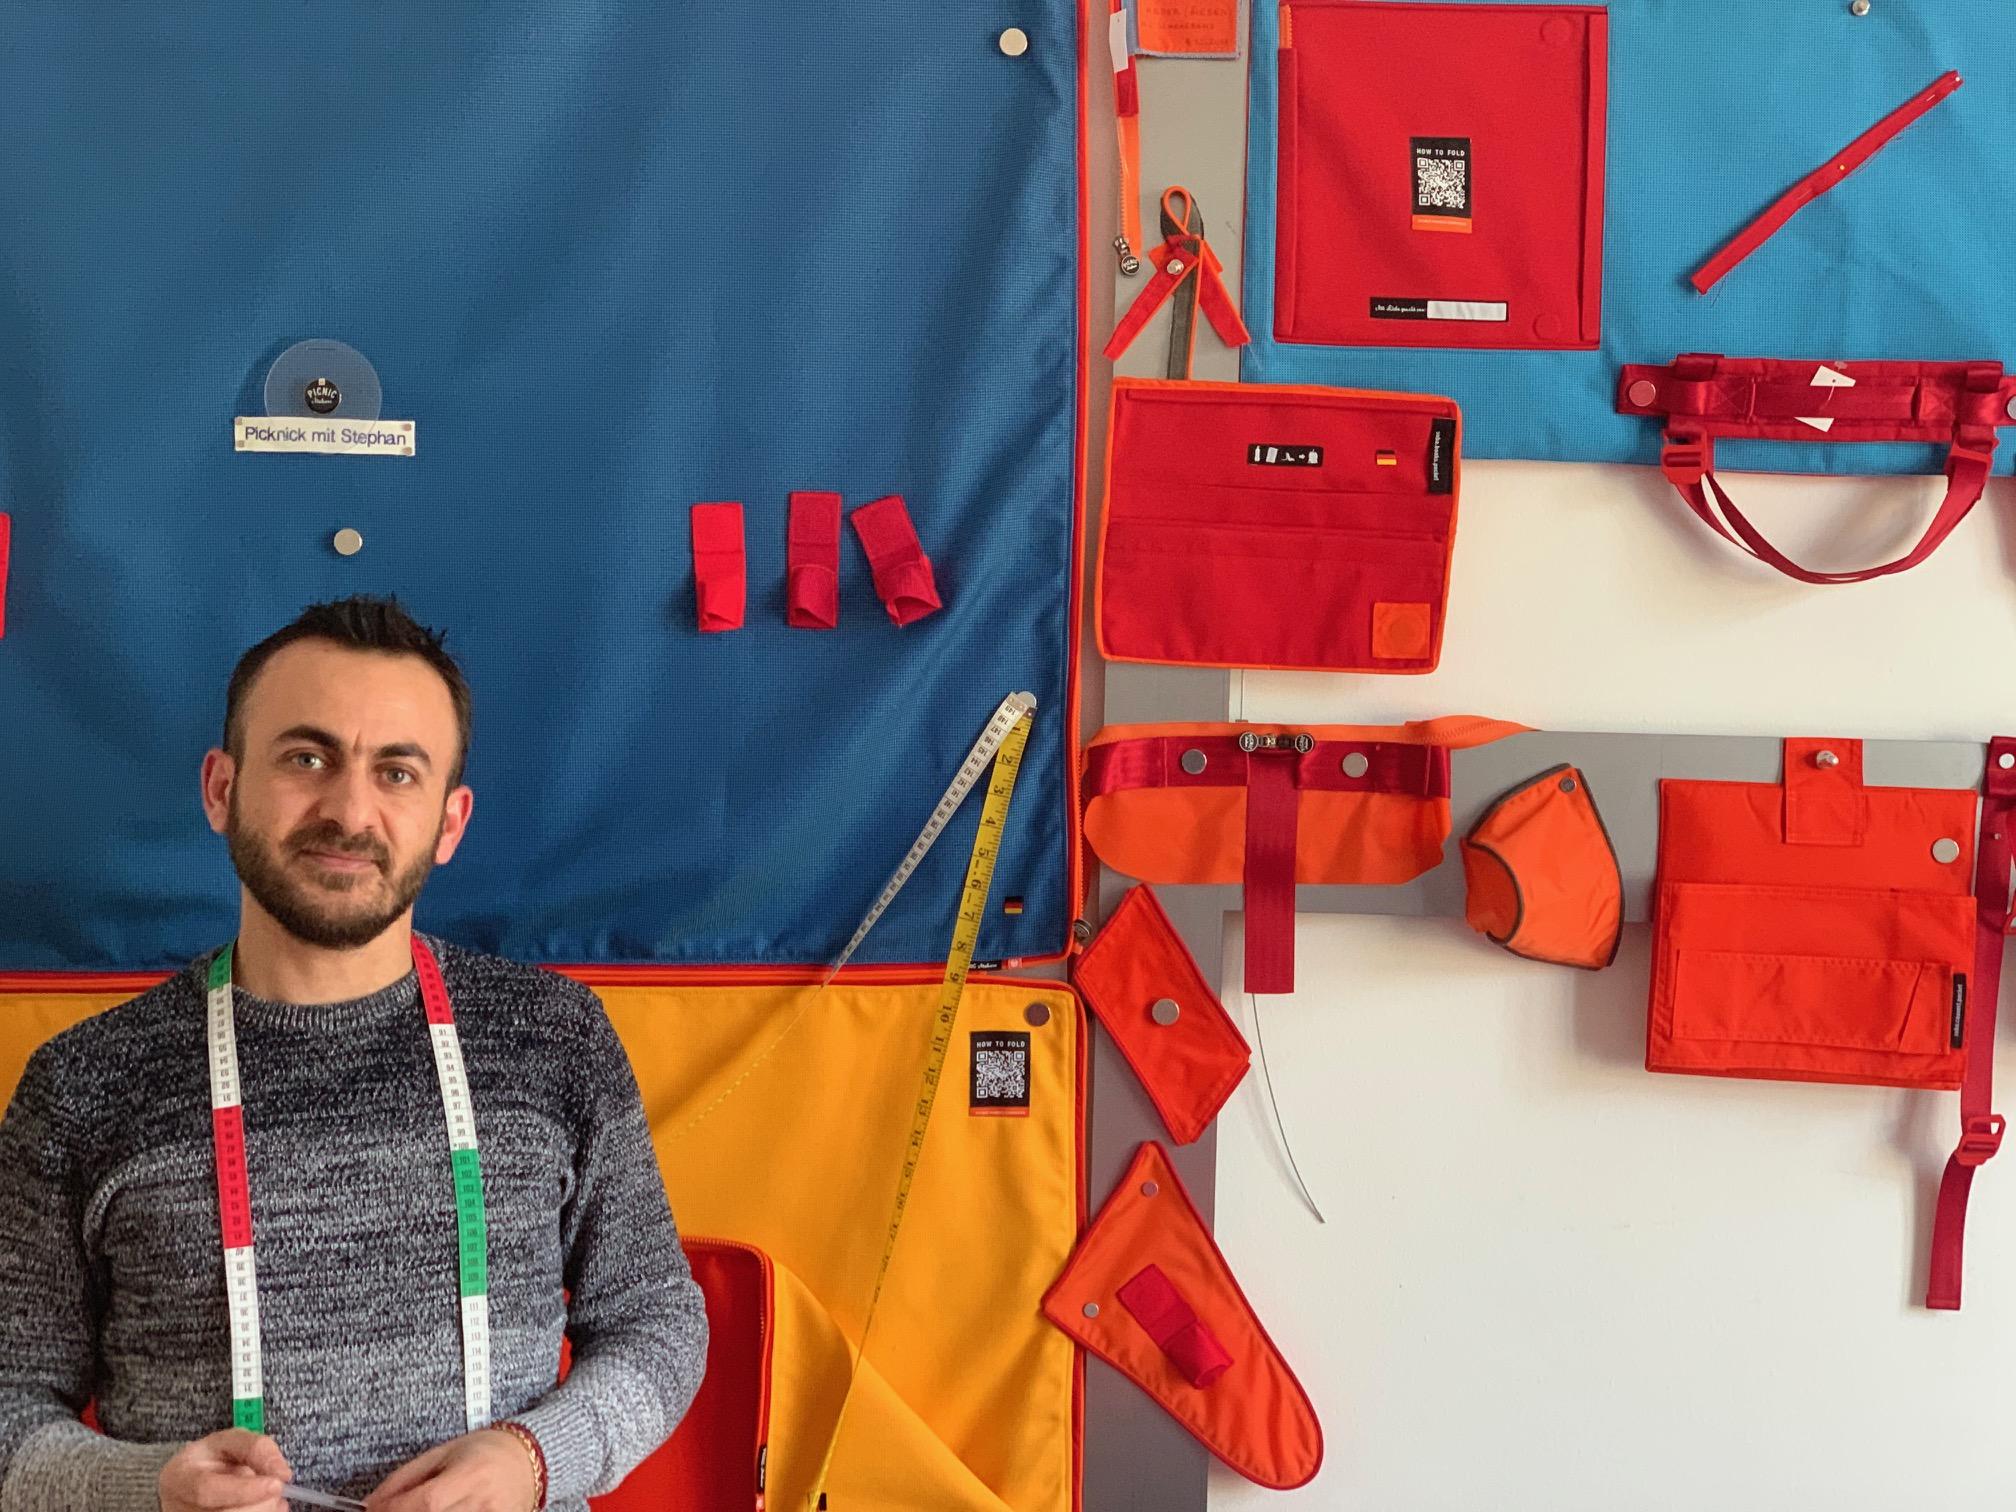 Suba Picnic-Makers Aktuelle Job-Angebote bei SUBA Picnic Makers in Hamburg